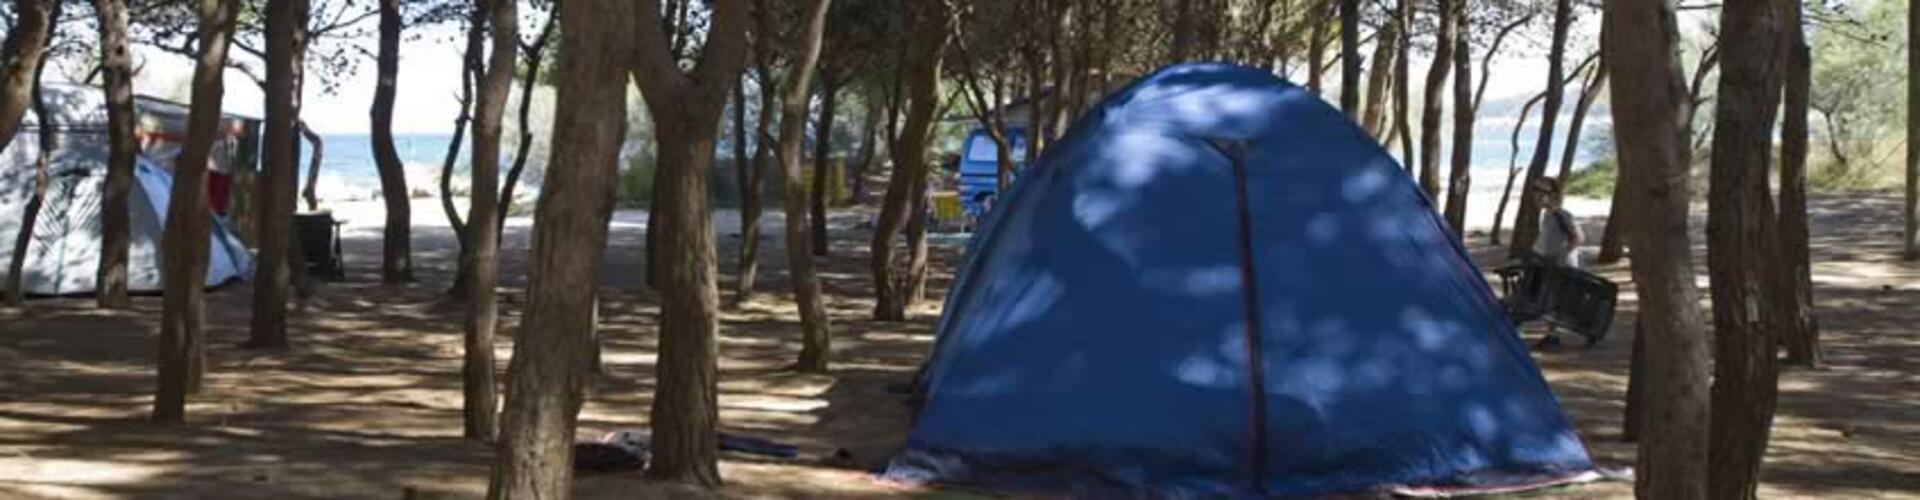 lavecchiatorregallipoli de campingplatz 008